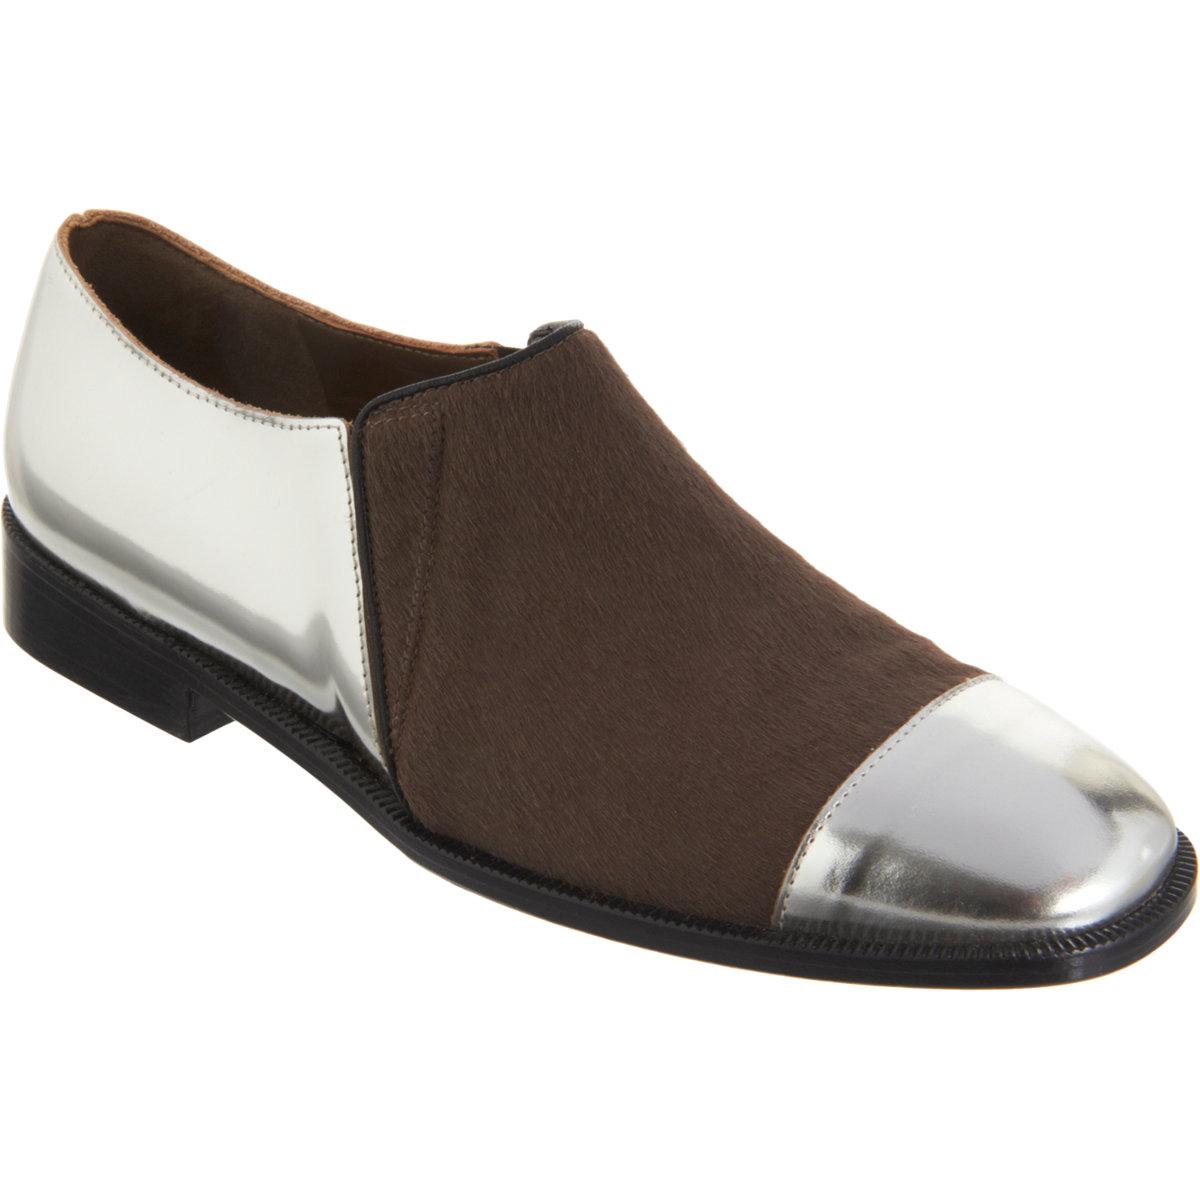 Rinaldi Shoes Canada